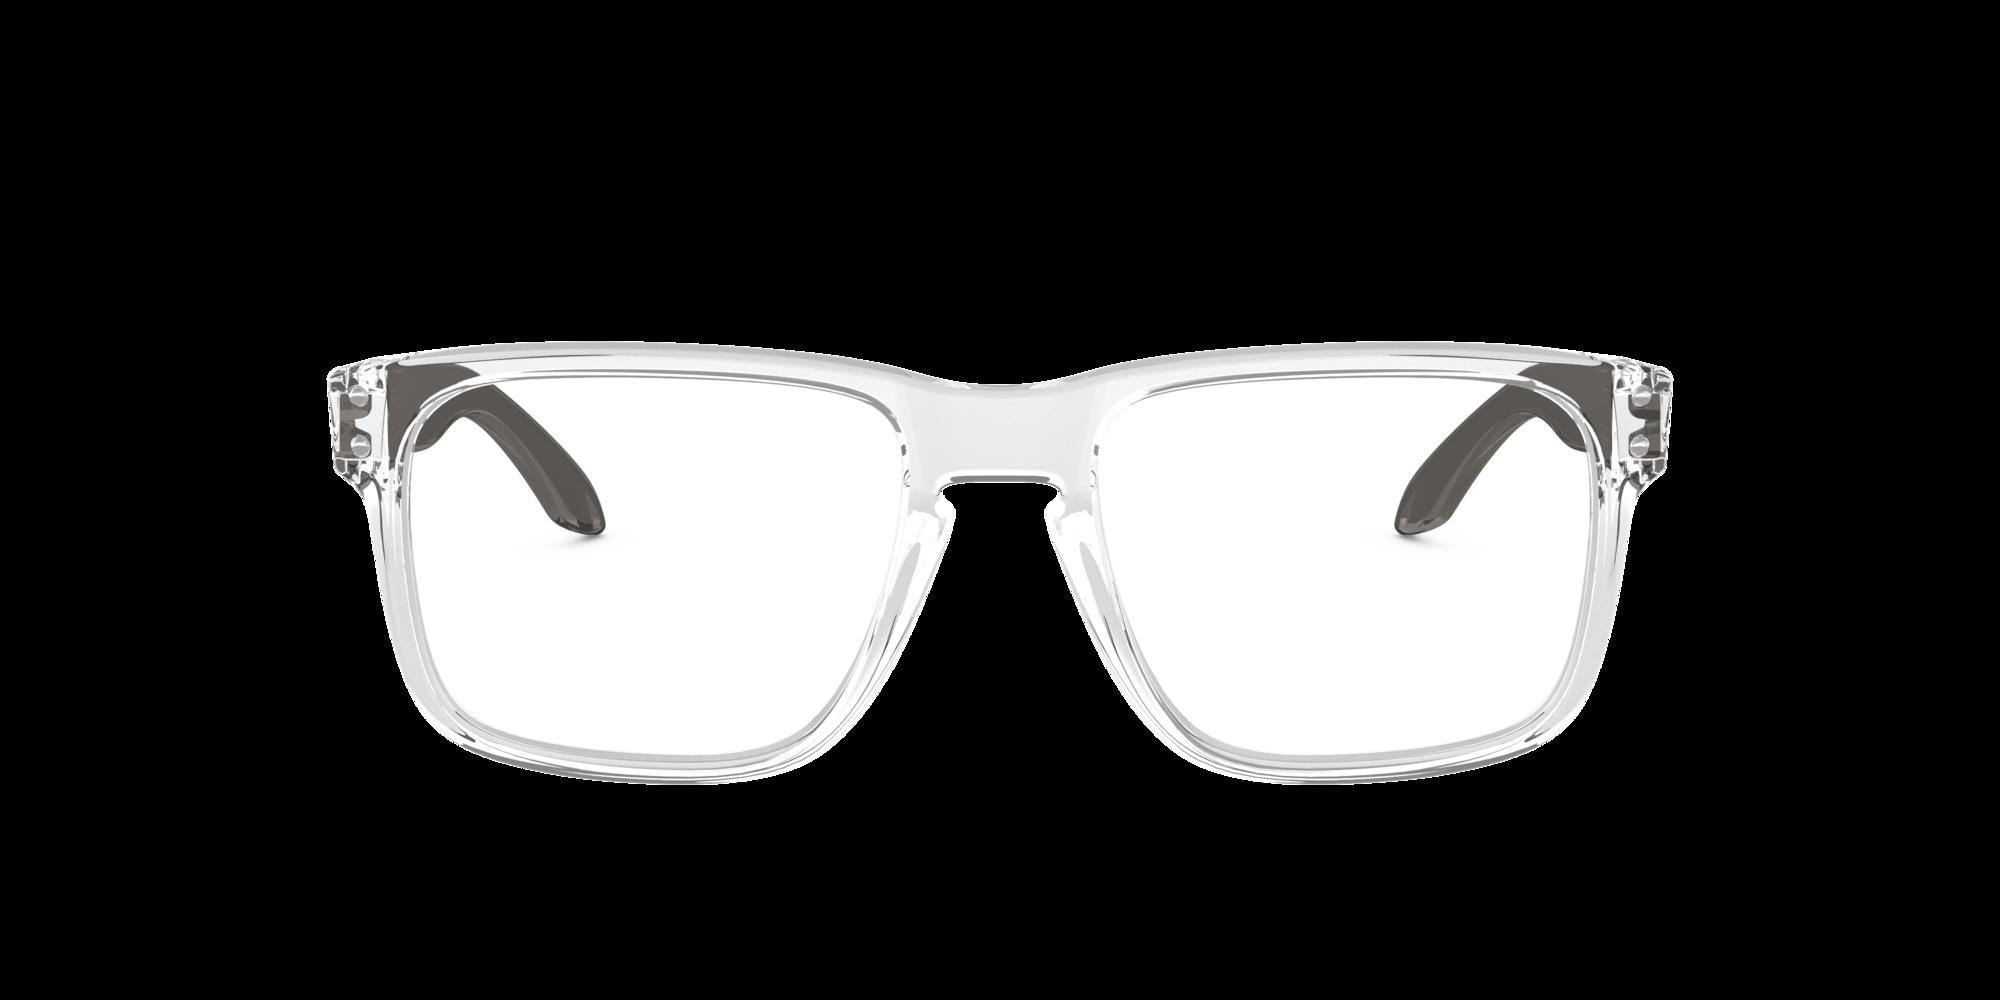 Image for OX8156 HOLBROOK RX from LensCrafters | Glasses, Prescription Glasses Online, Eyewear